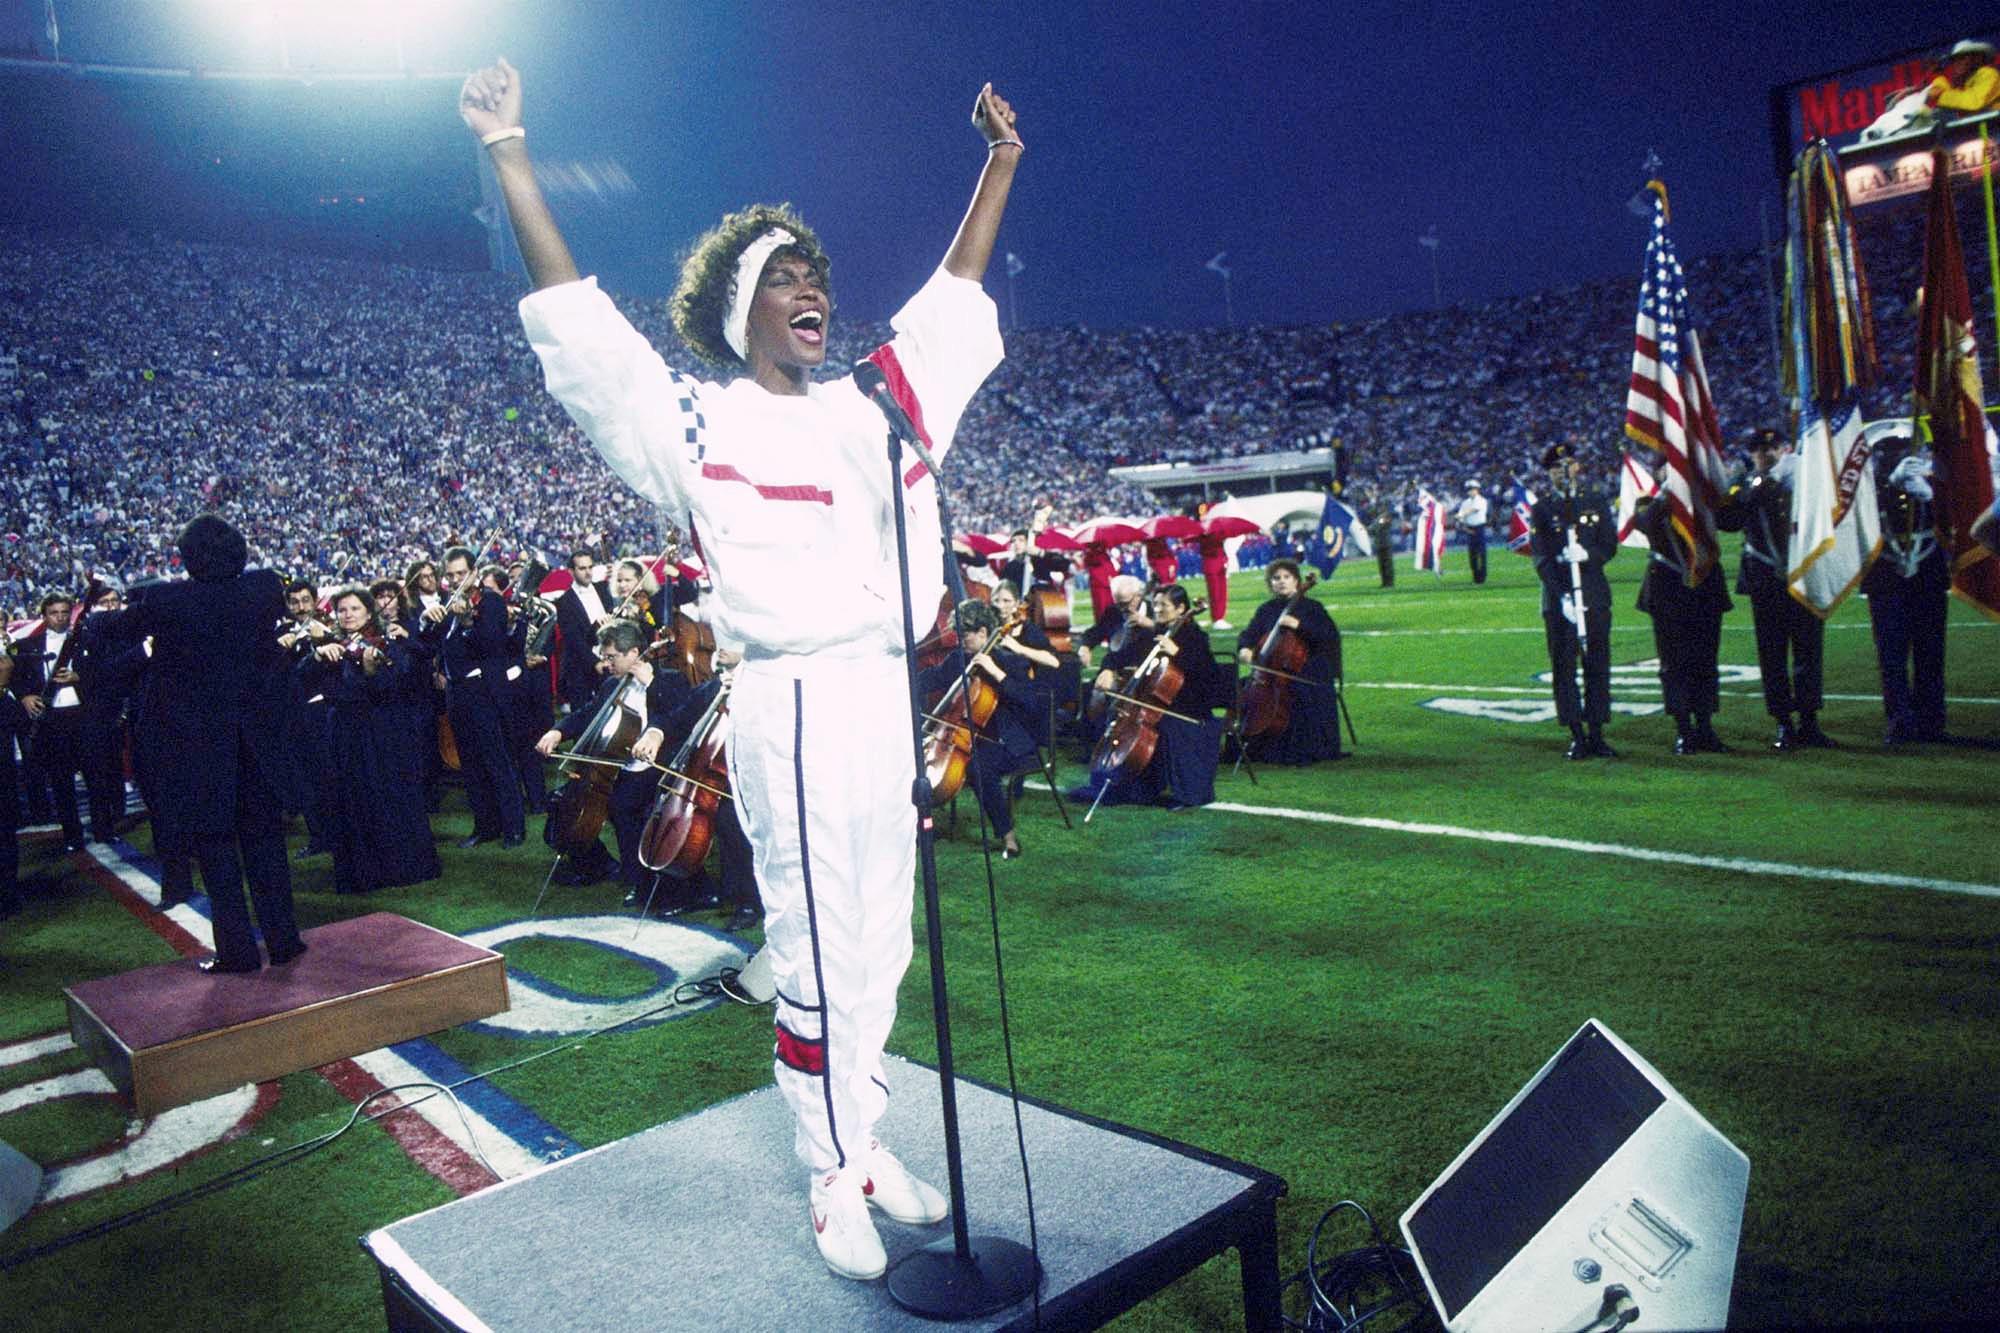 The 10 best Super Bowl national anthem performances